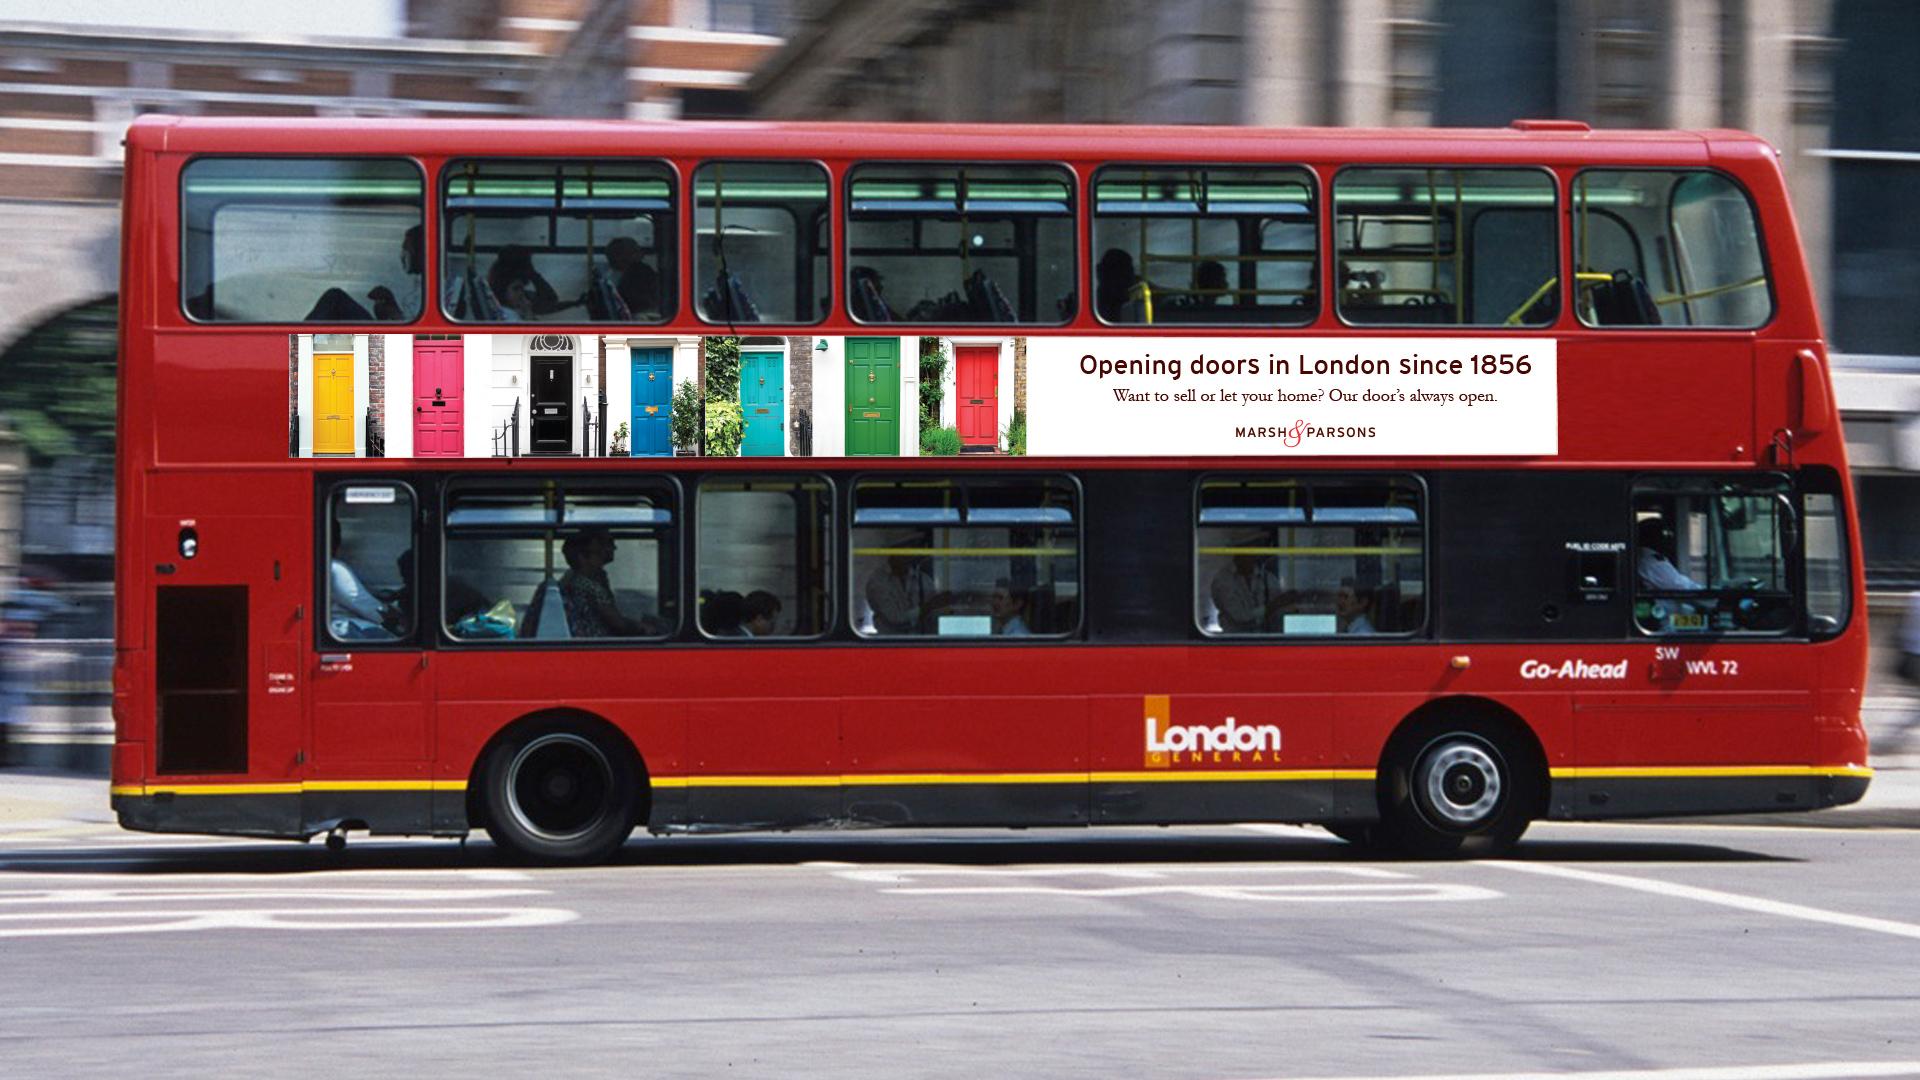 Marsh&Parsons_bus_02.jpg